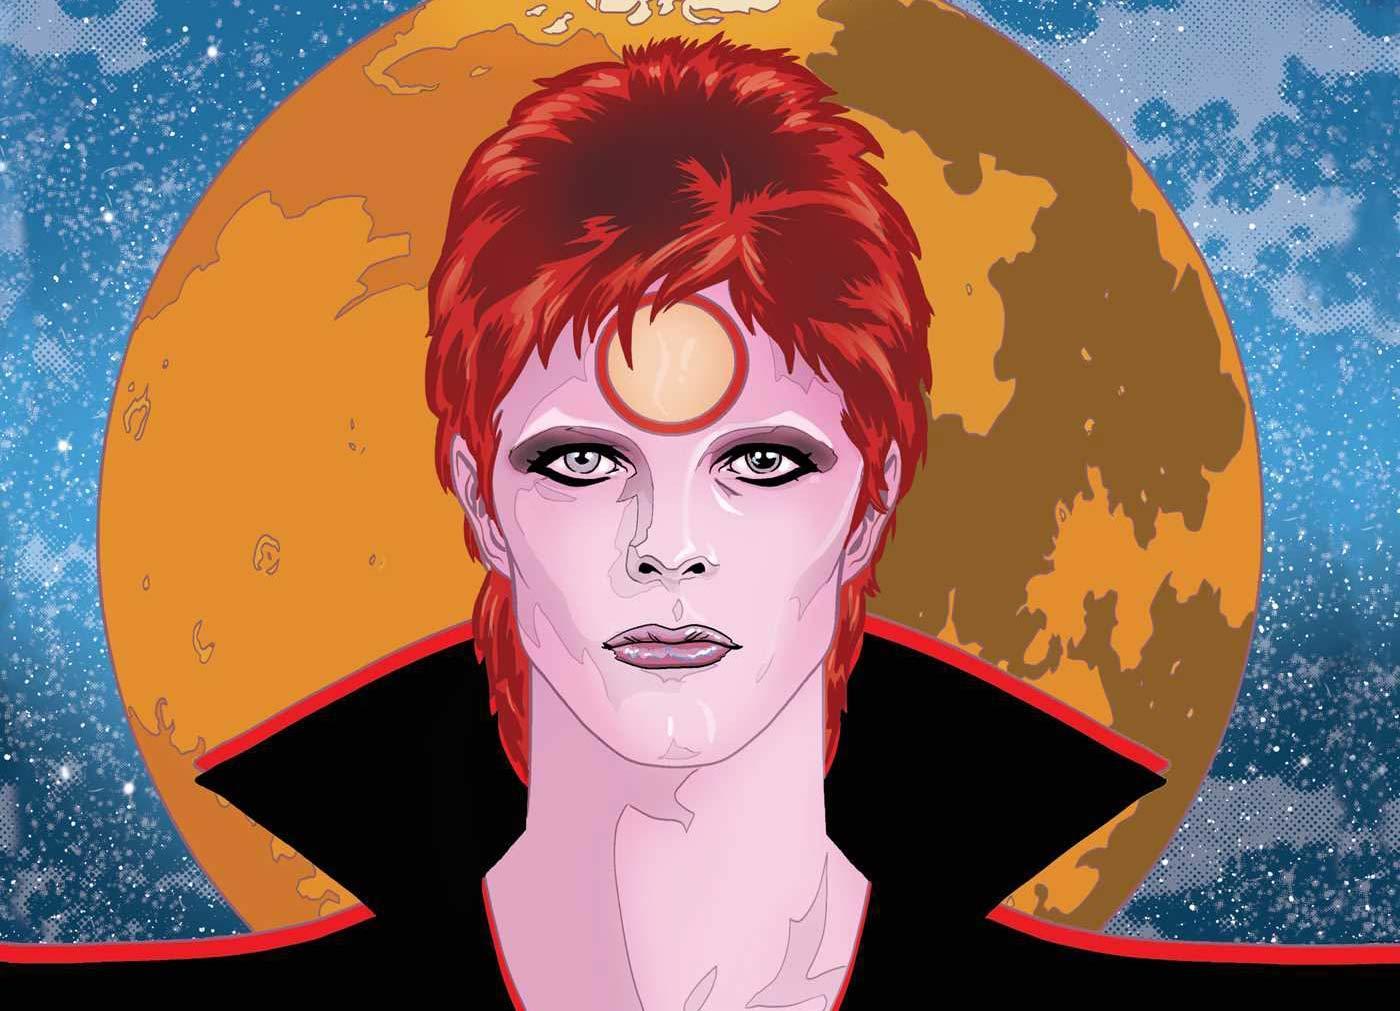 david bowie hq graphic novel the story of ziggy stardust quadrinhos noticias revista ambrosia